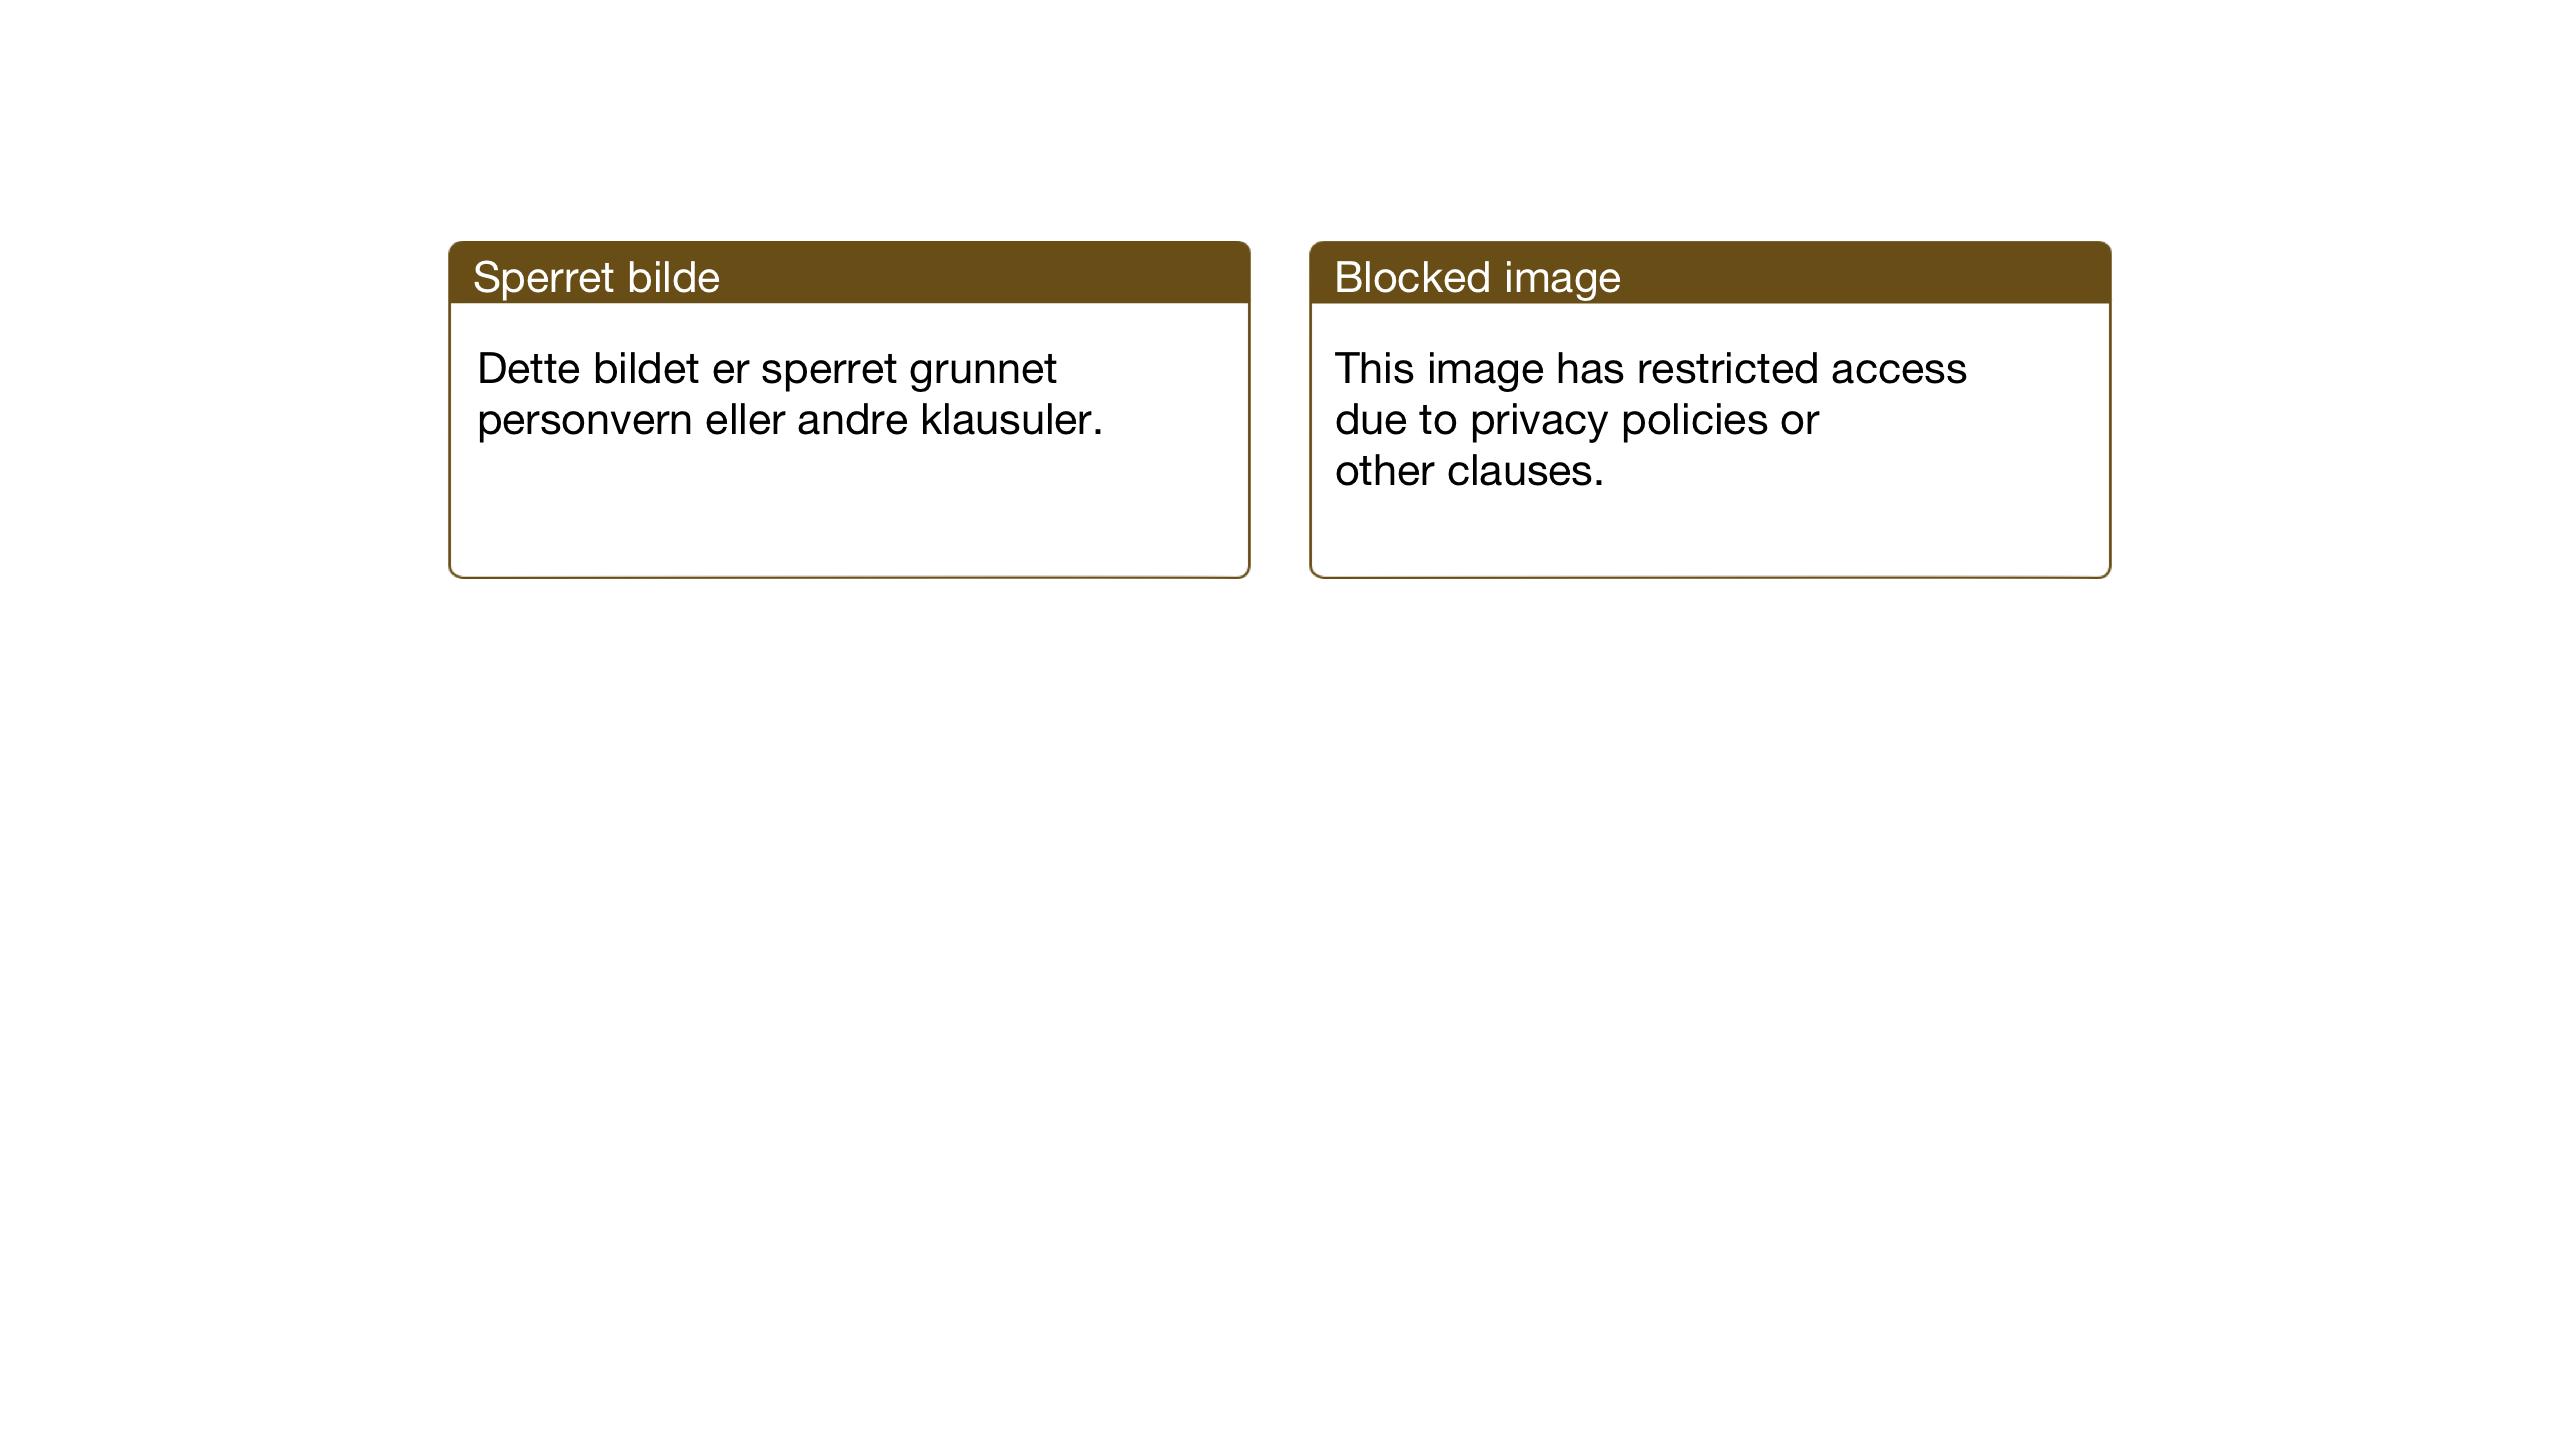 SAT, Ministerialprotokoller, klokkerbøker og fødselsregistre - Nordland, 847/L0680: Klokkerbok nr. 847C08, 1930-1947, s. 56